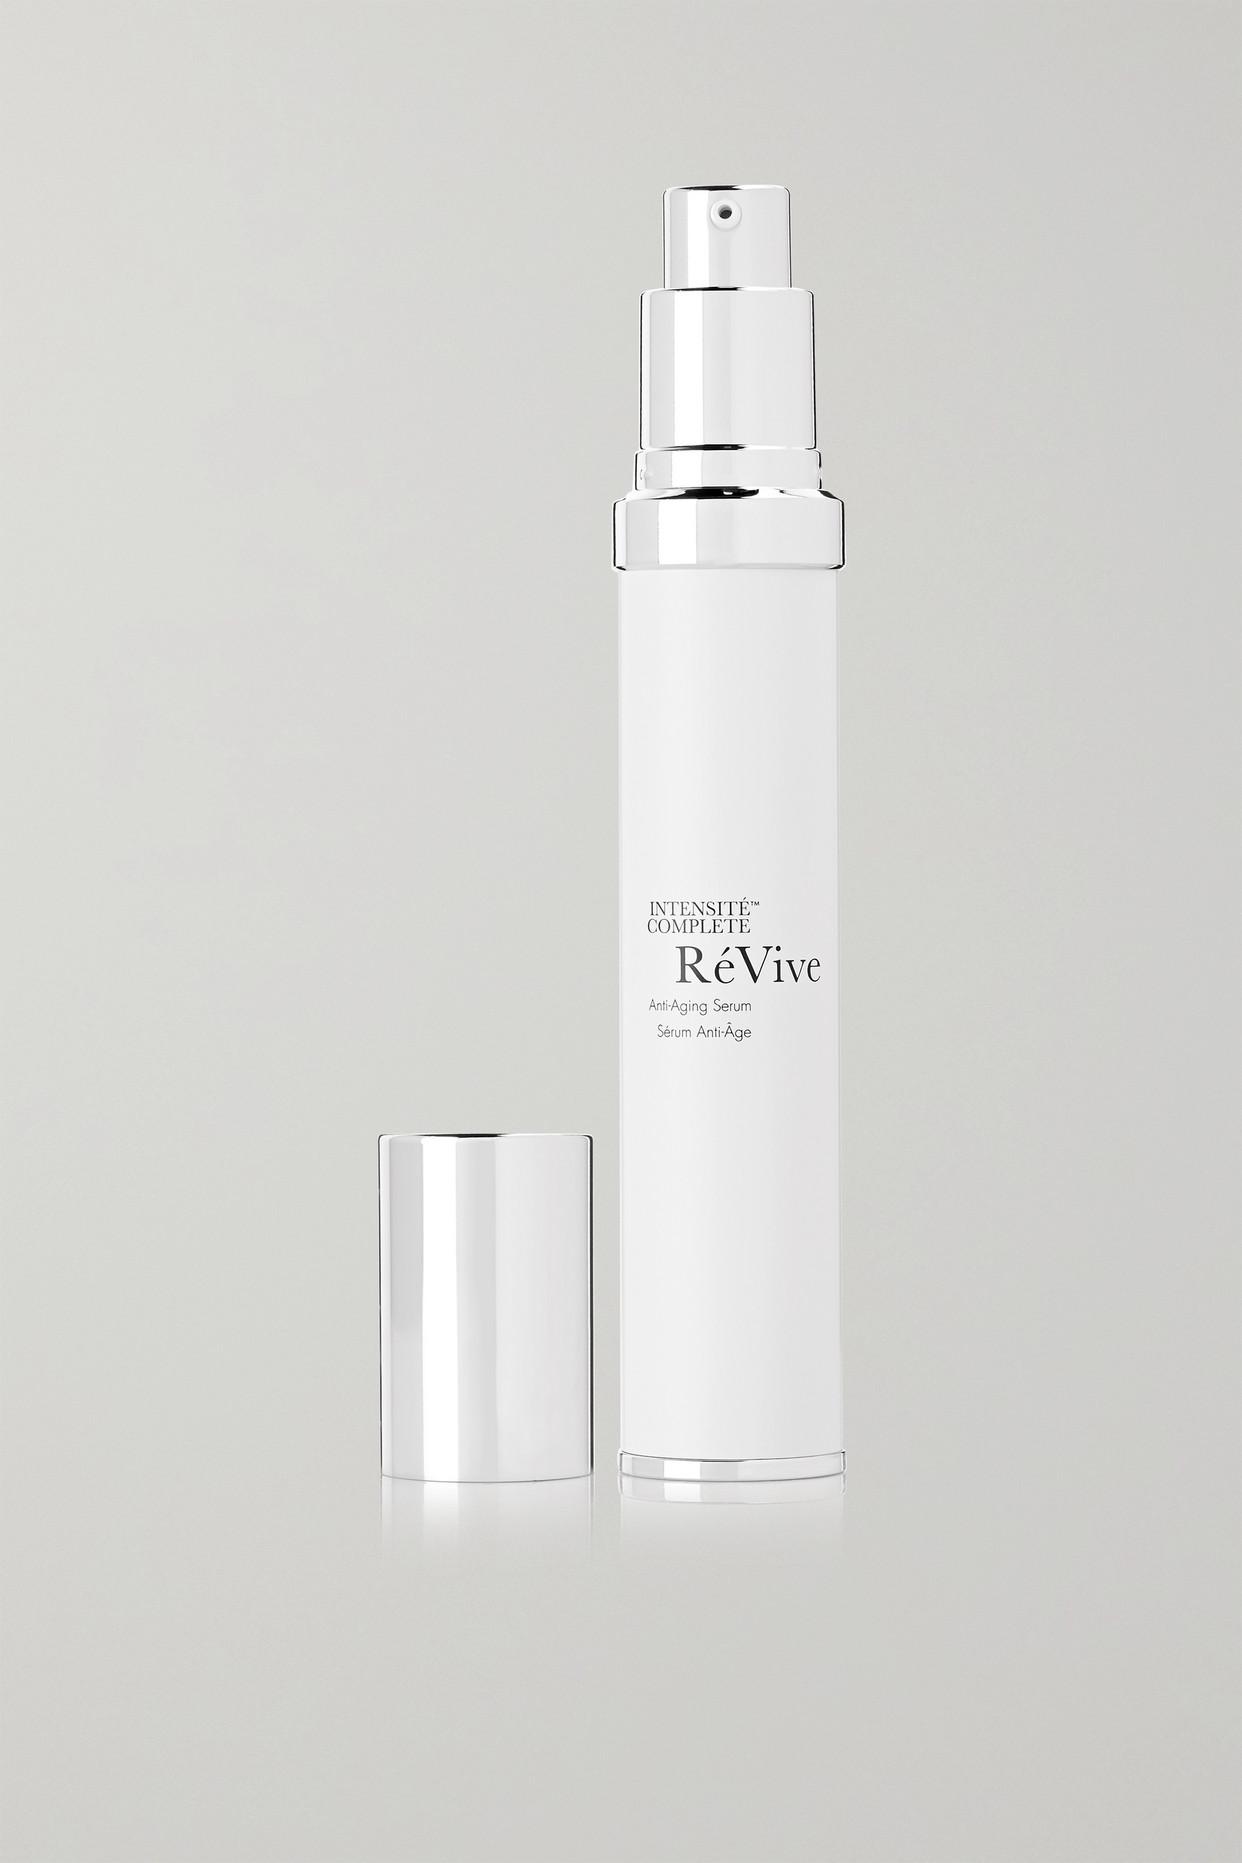 RÉVIVE - Intensité Complete Anti-aging Serum, 30ml - one size